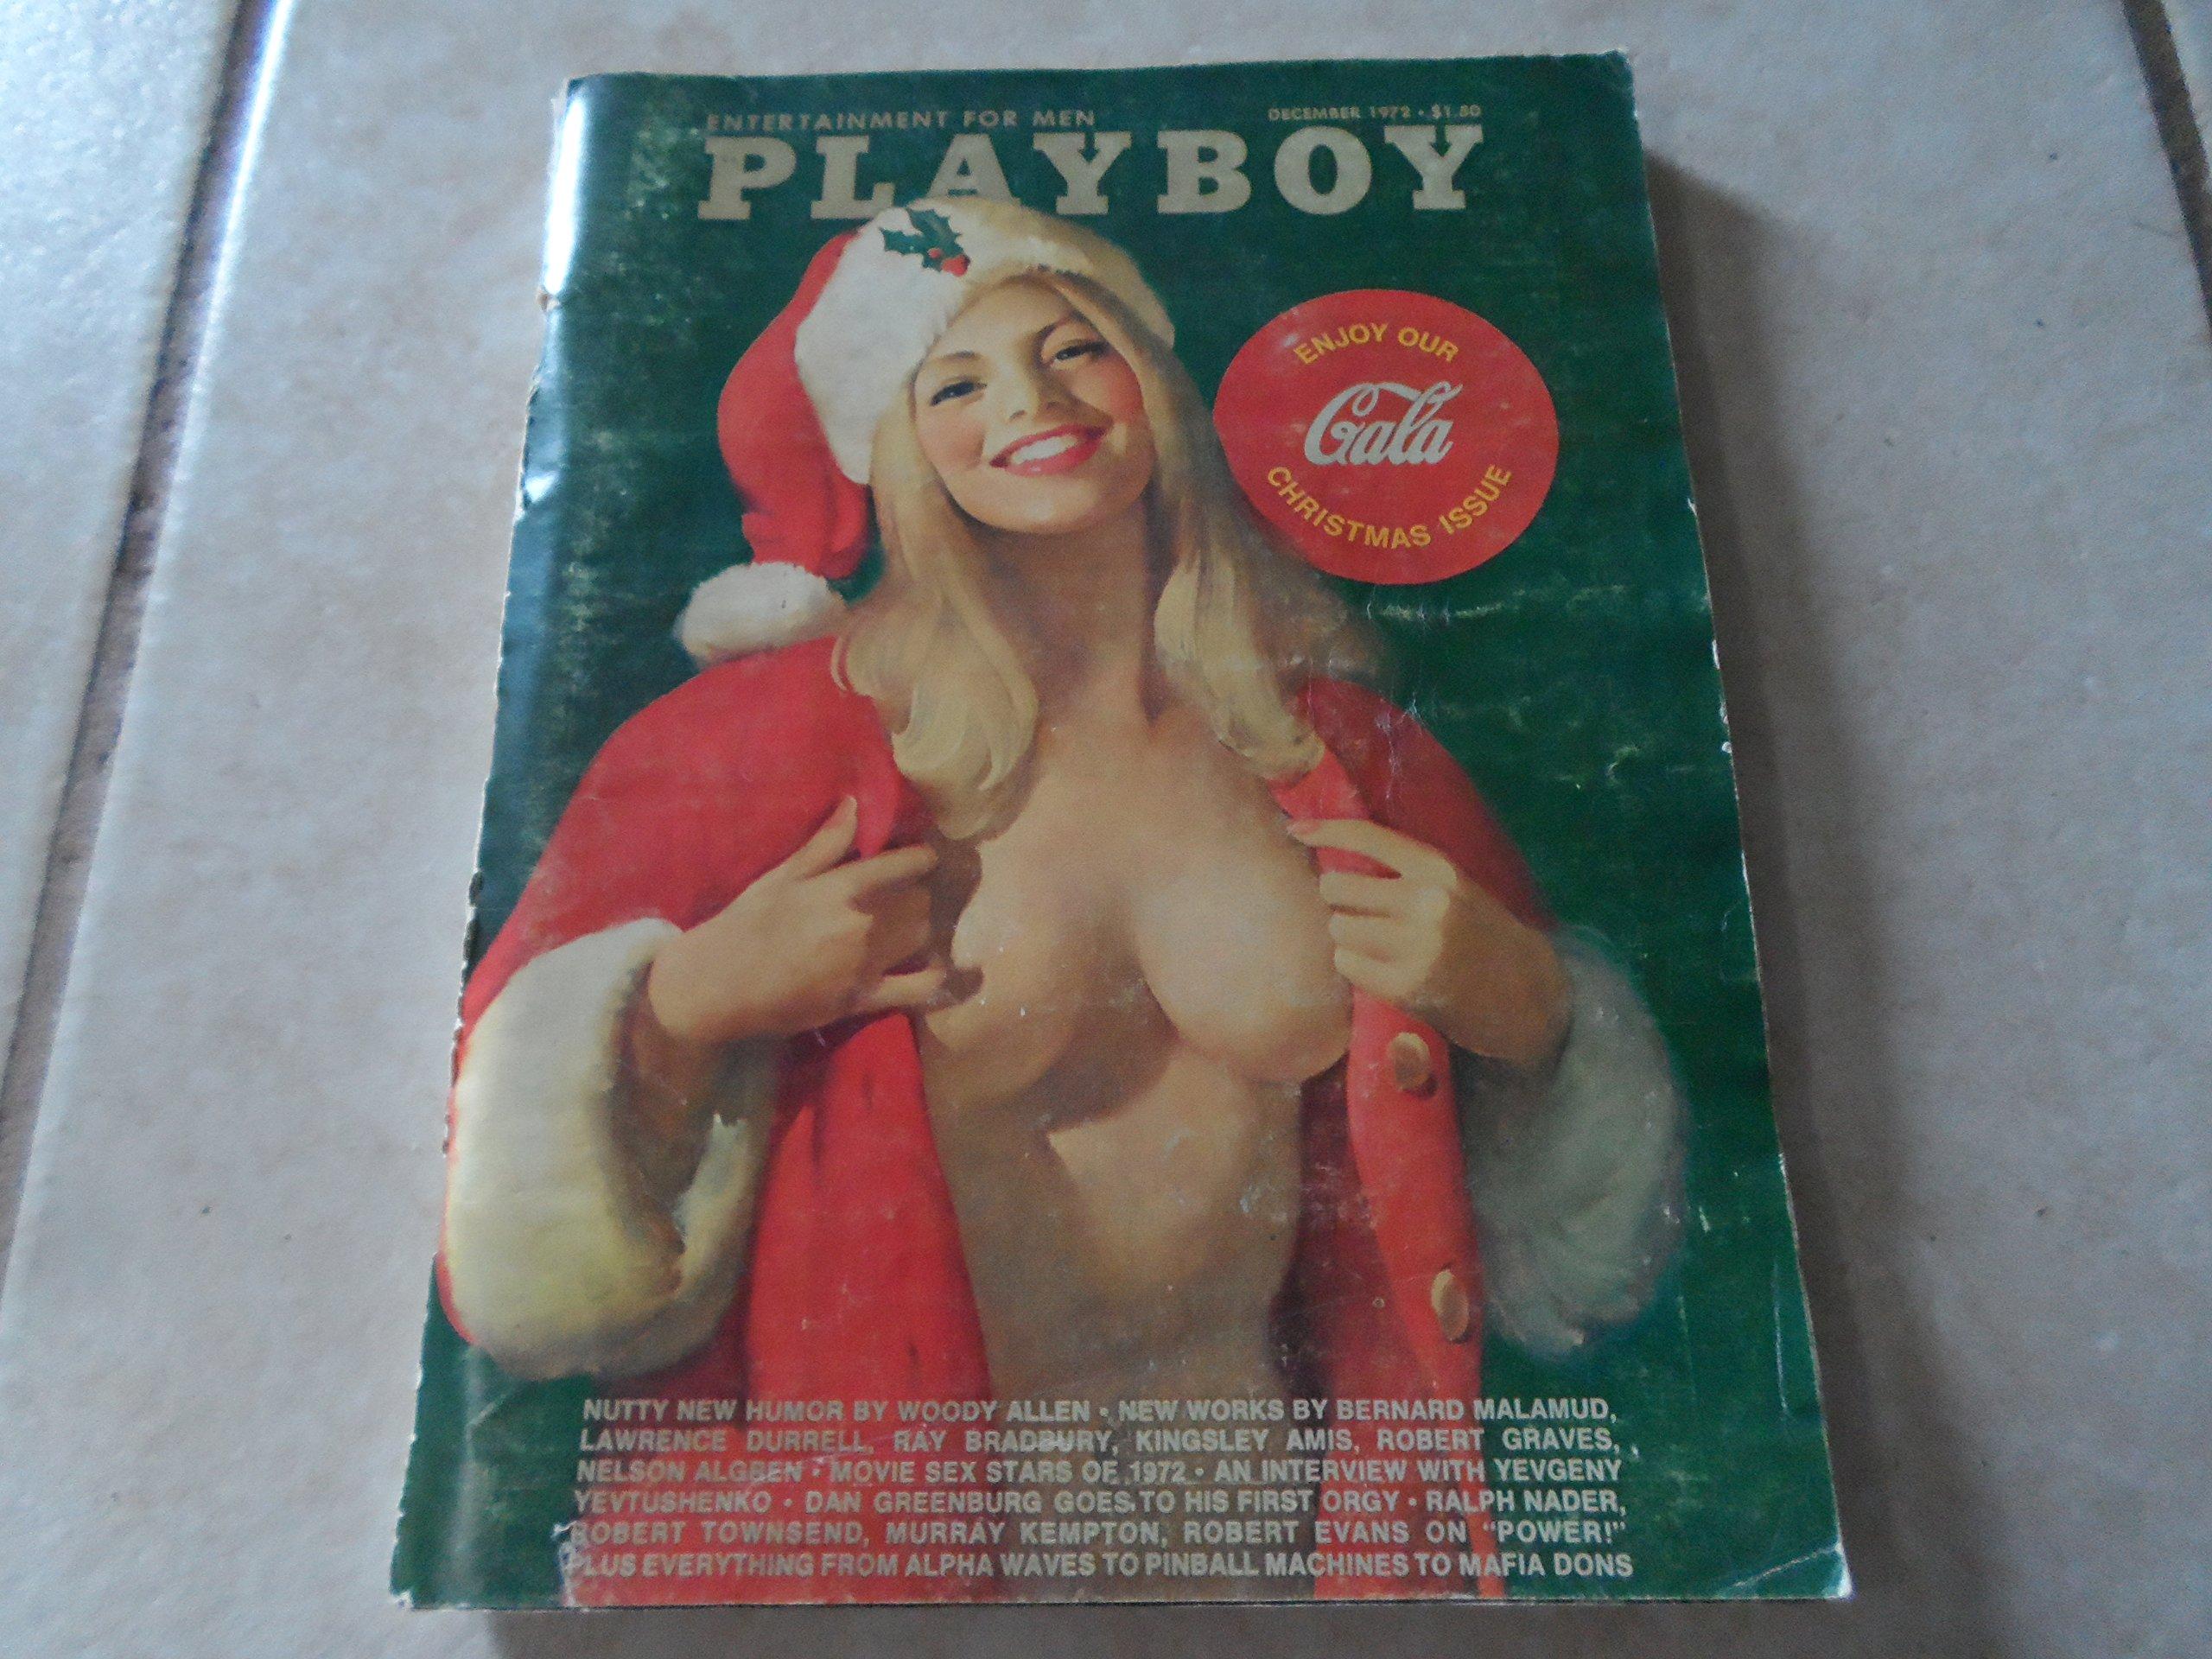 Shannen doherty in playboy december usa